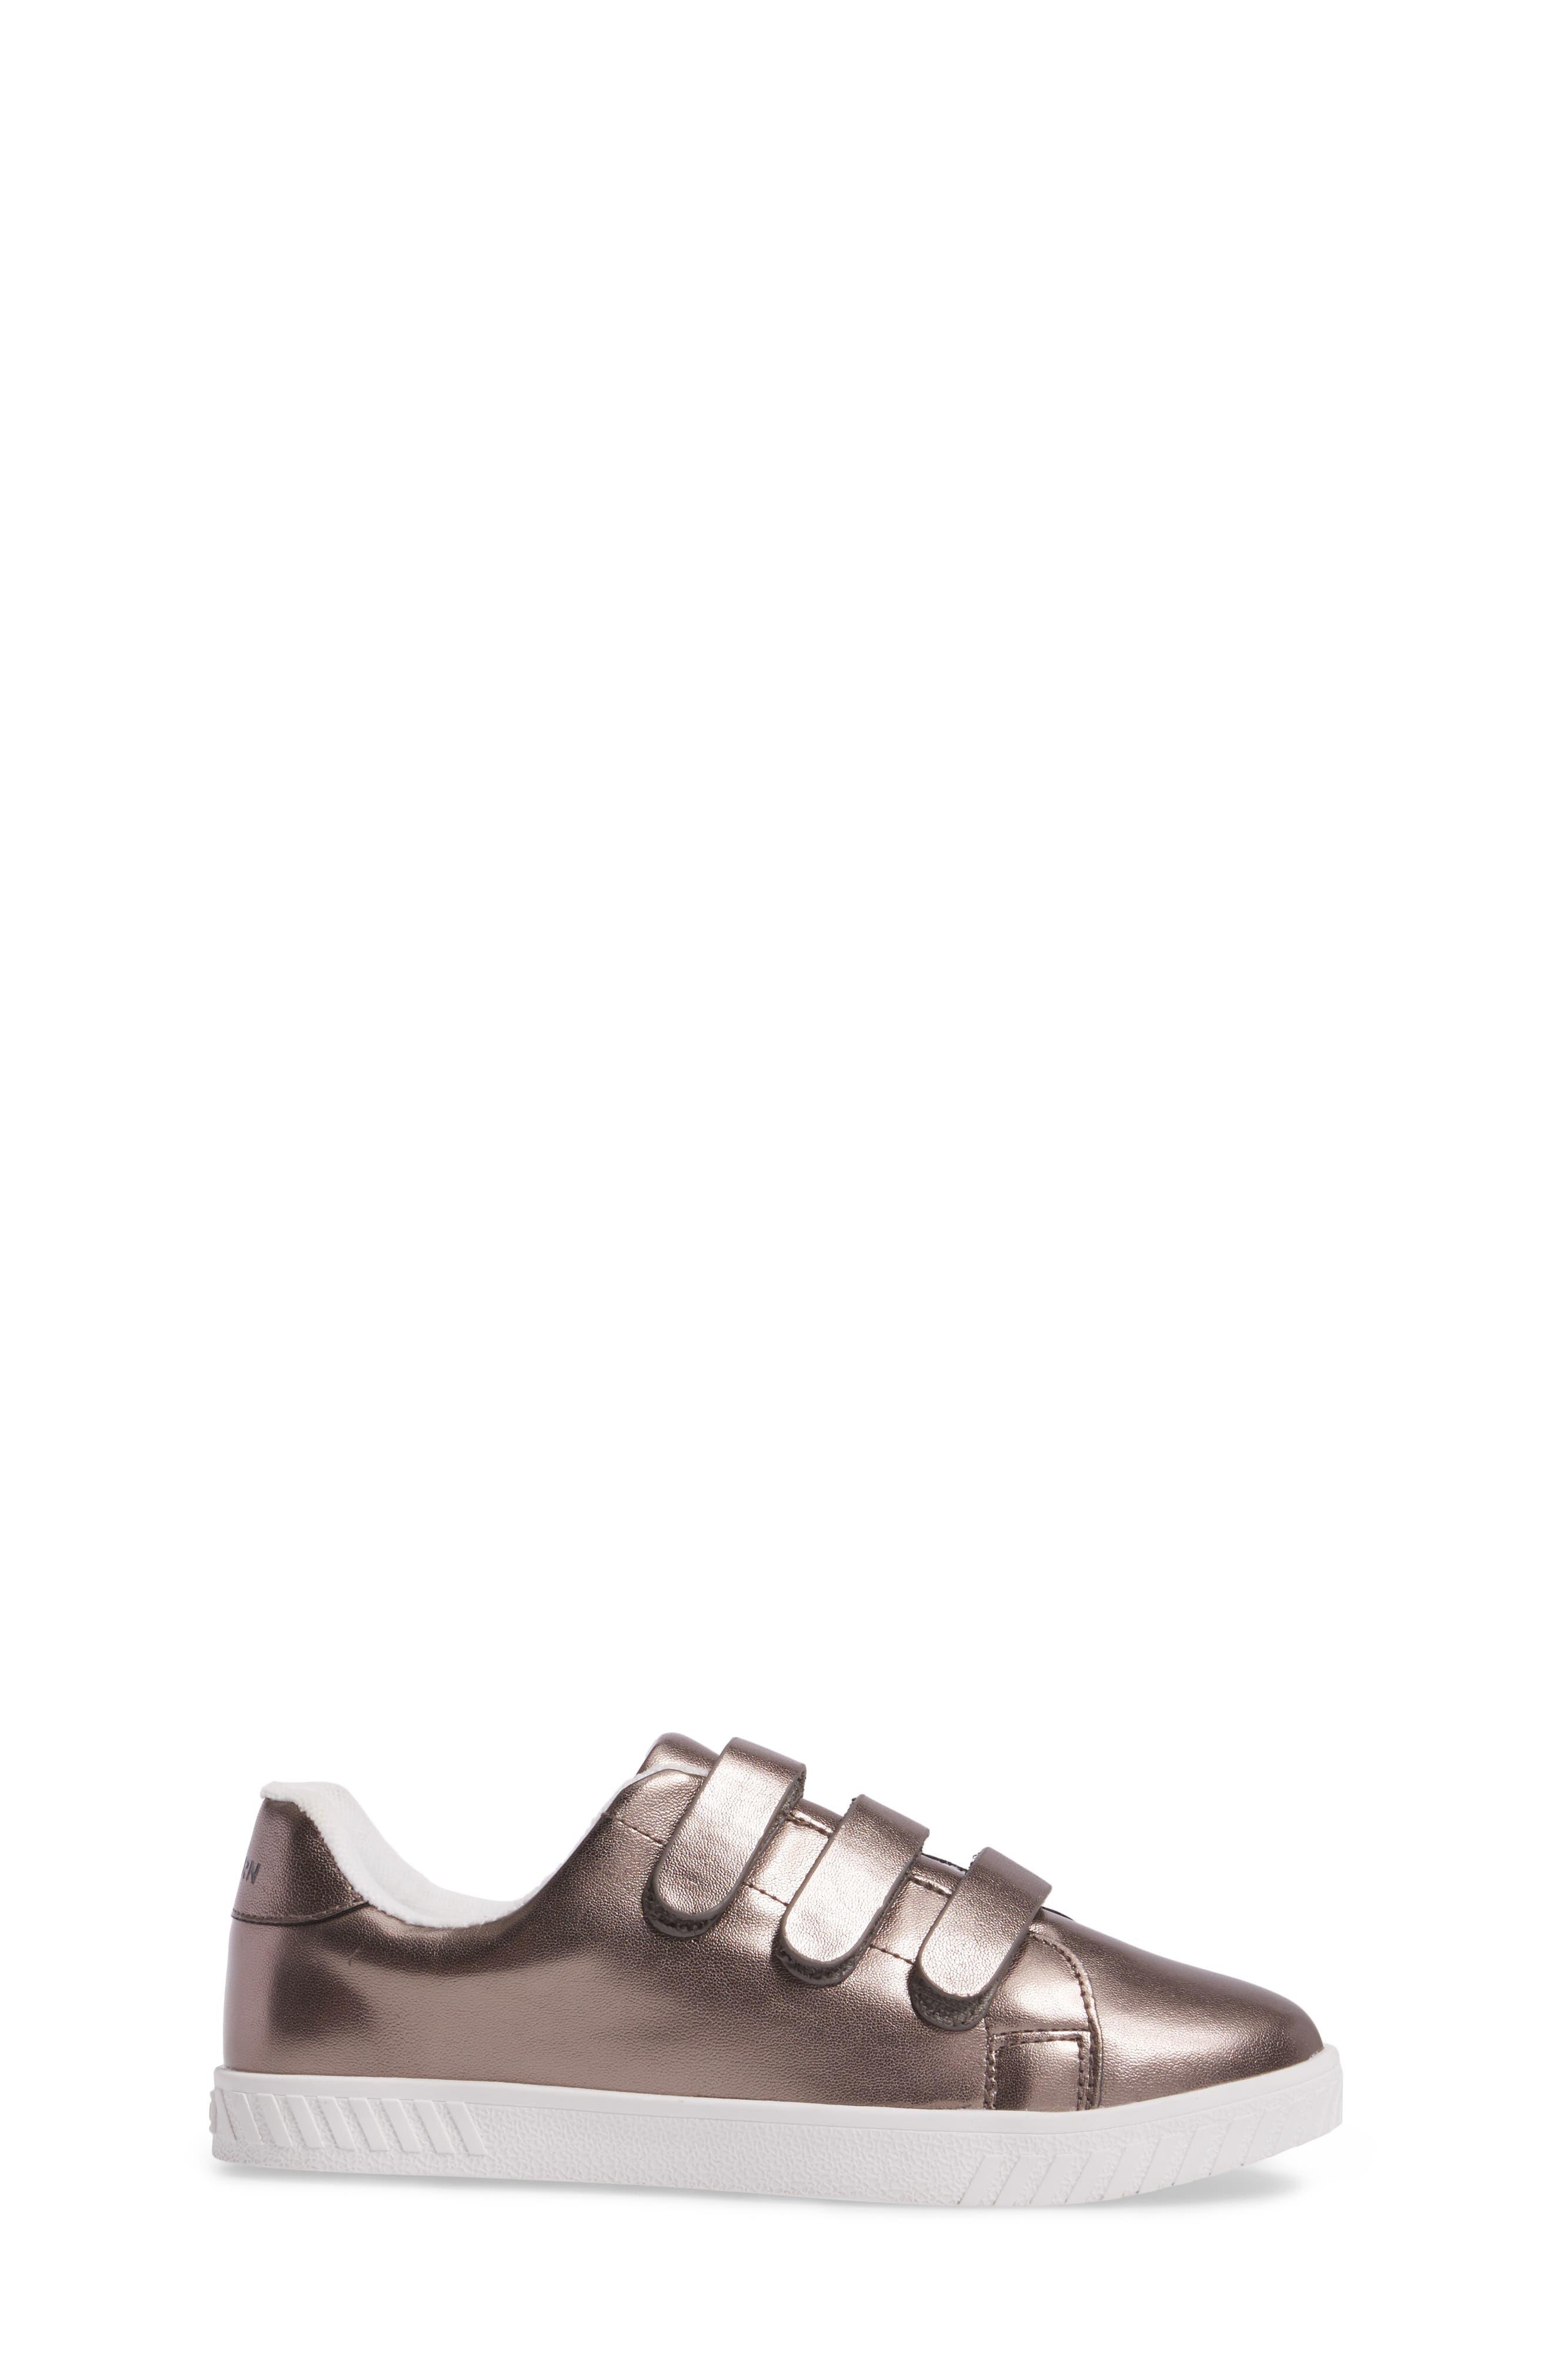 Alternate Image 3  - Tretorn Camden Carry Sneaker (Walker, Toddler, Little Kid & Big Kid)